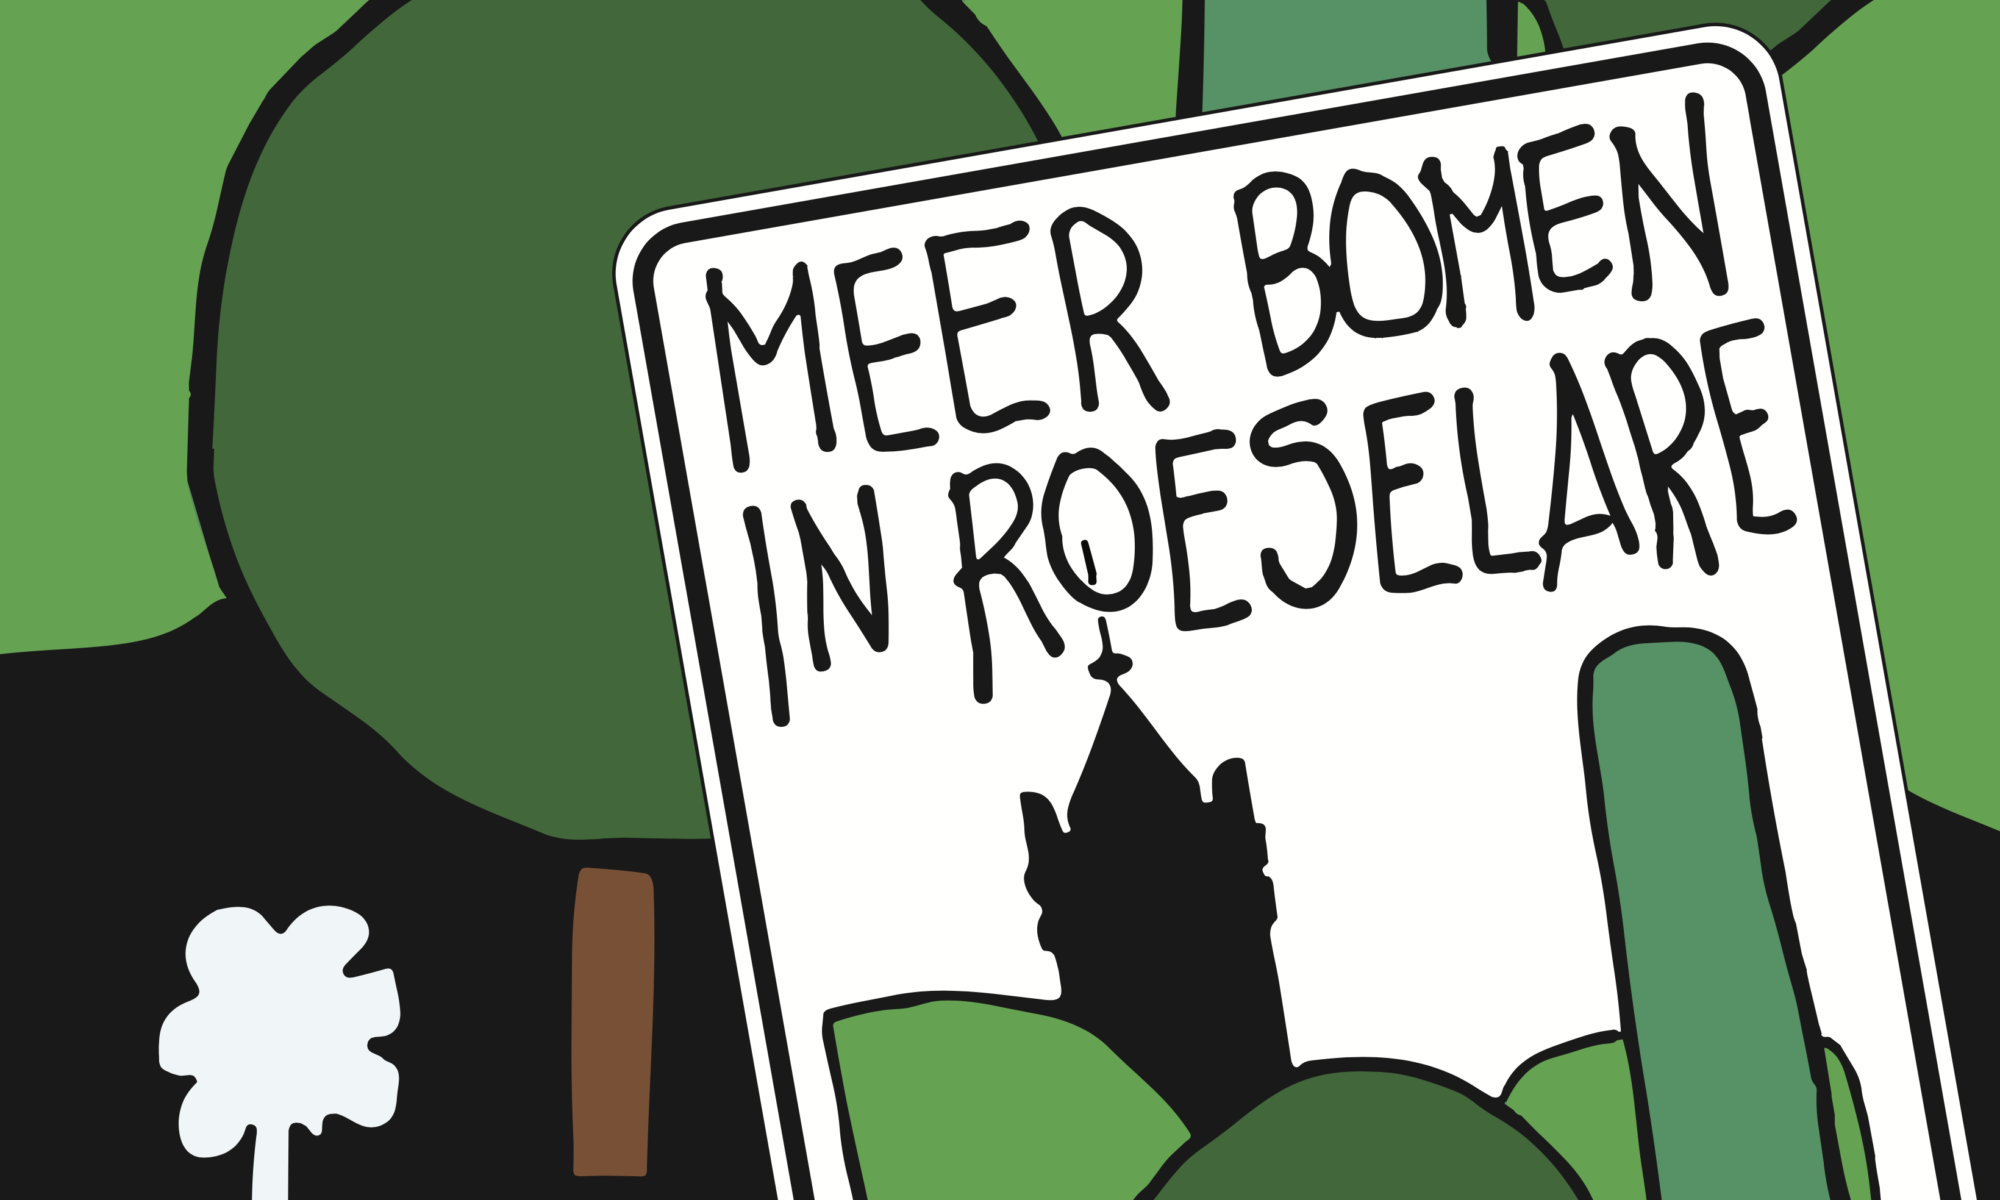 Meer bomen in Roeselare